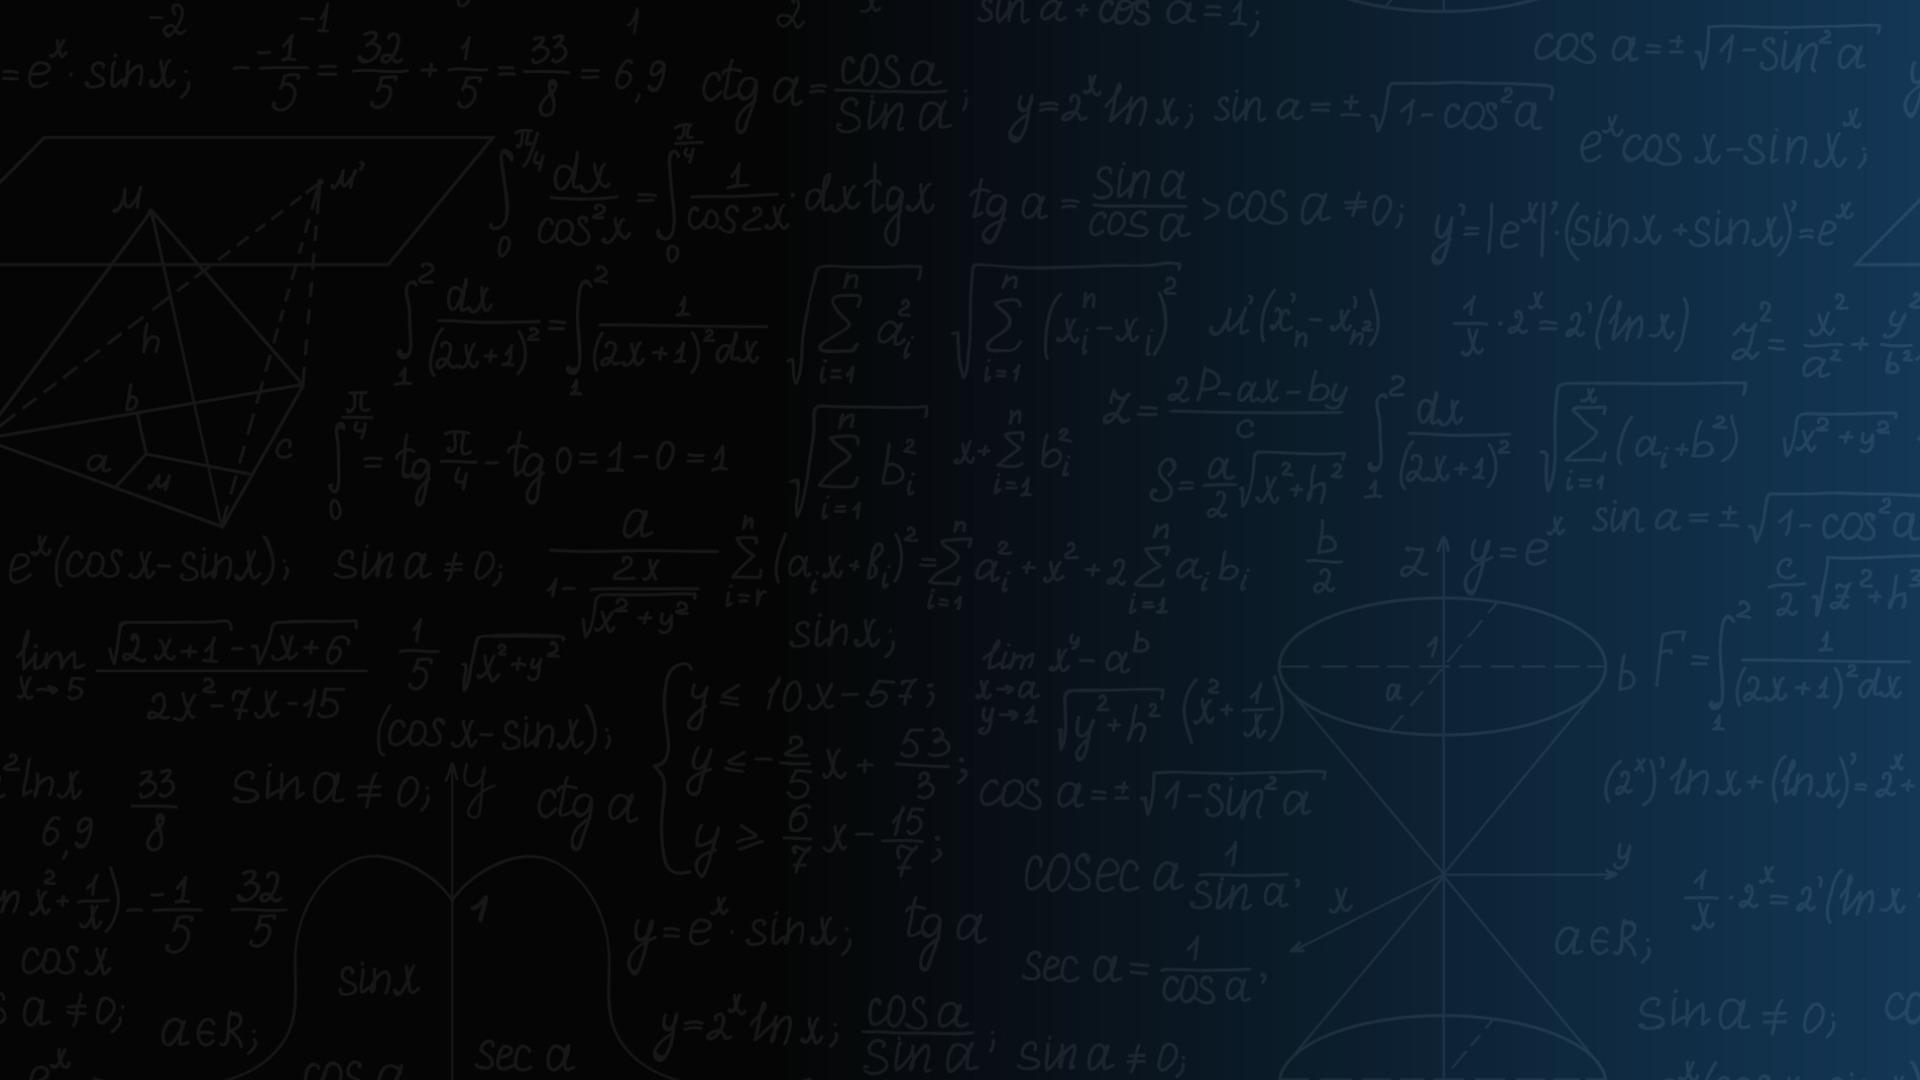 Curso de Cálculo Diferencial